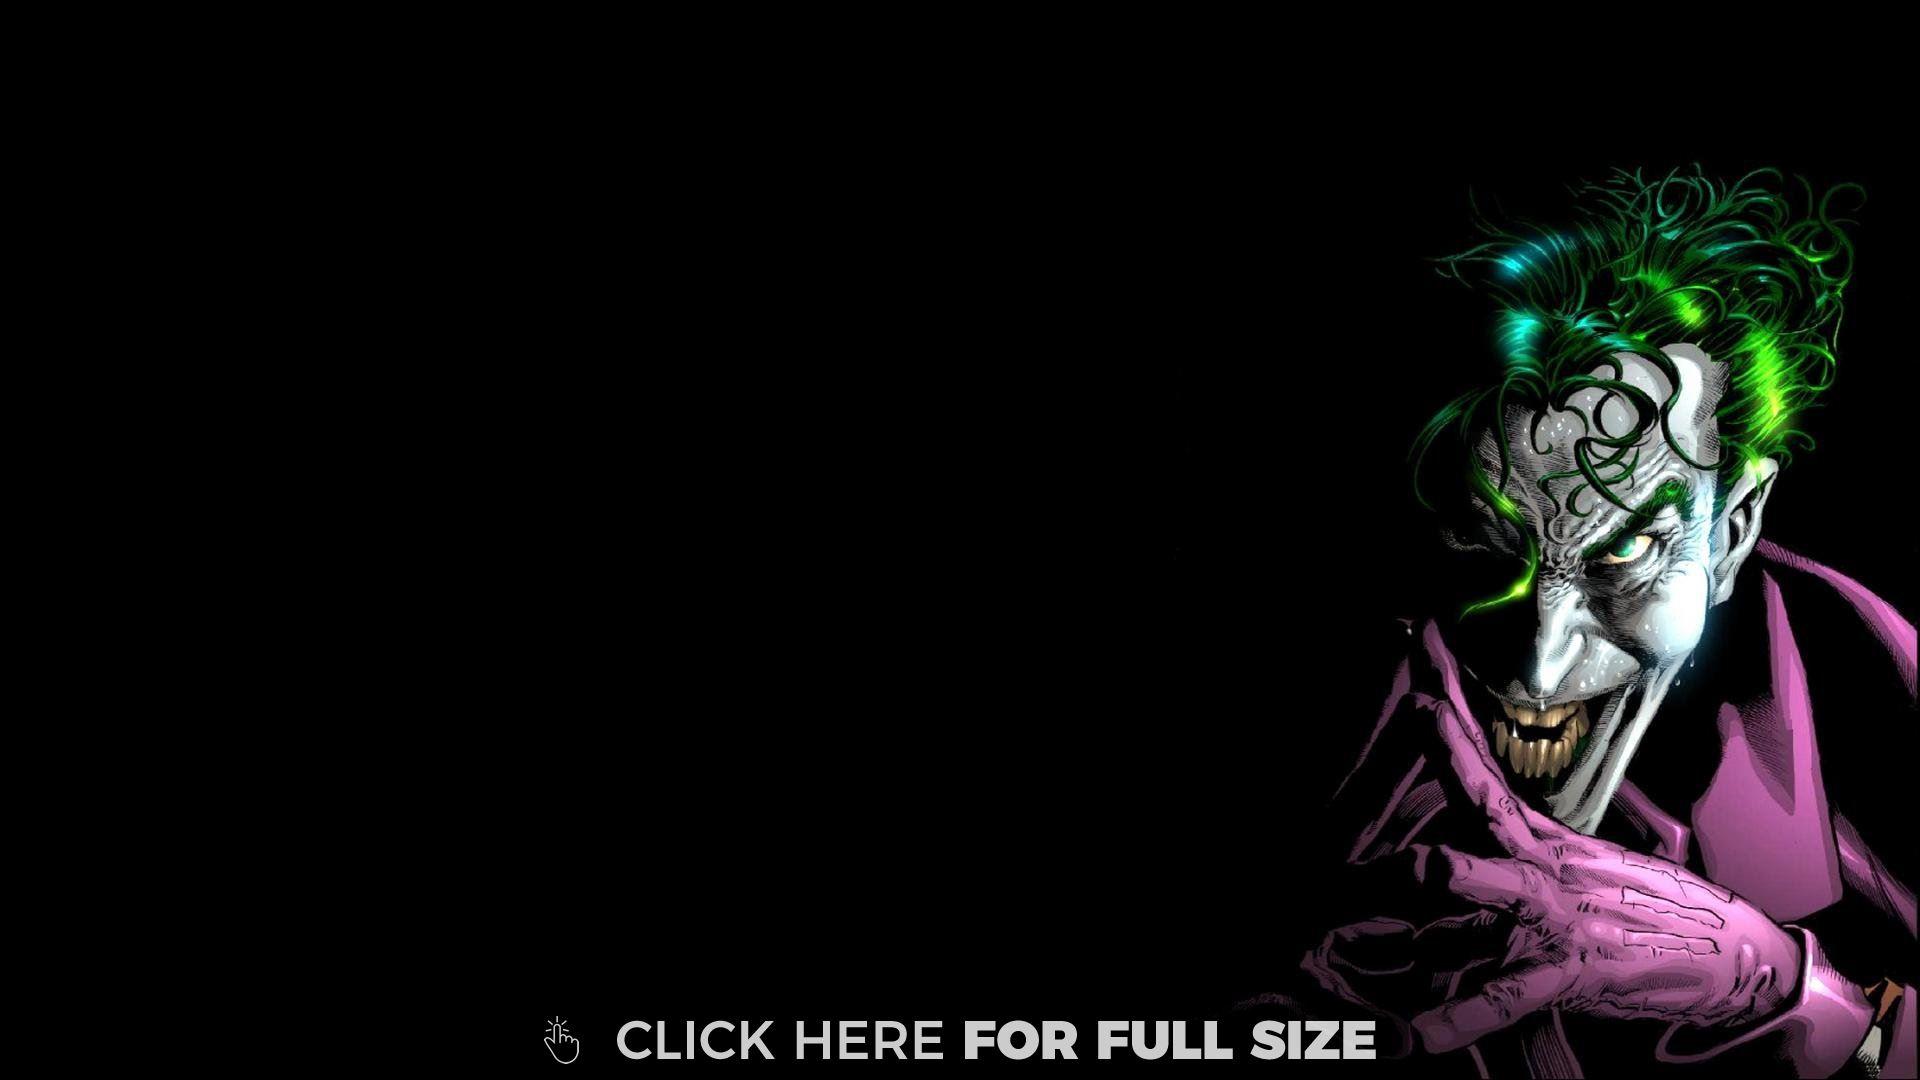 joker wallpapers photos and desktop backgrounds up to 8K 1920x1080